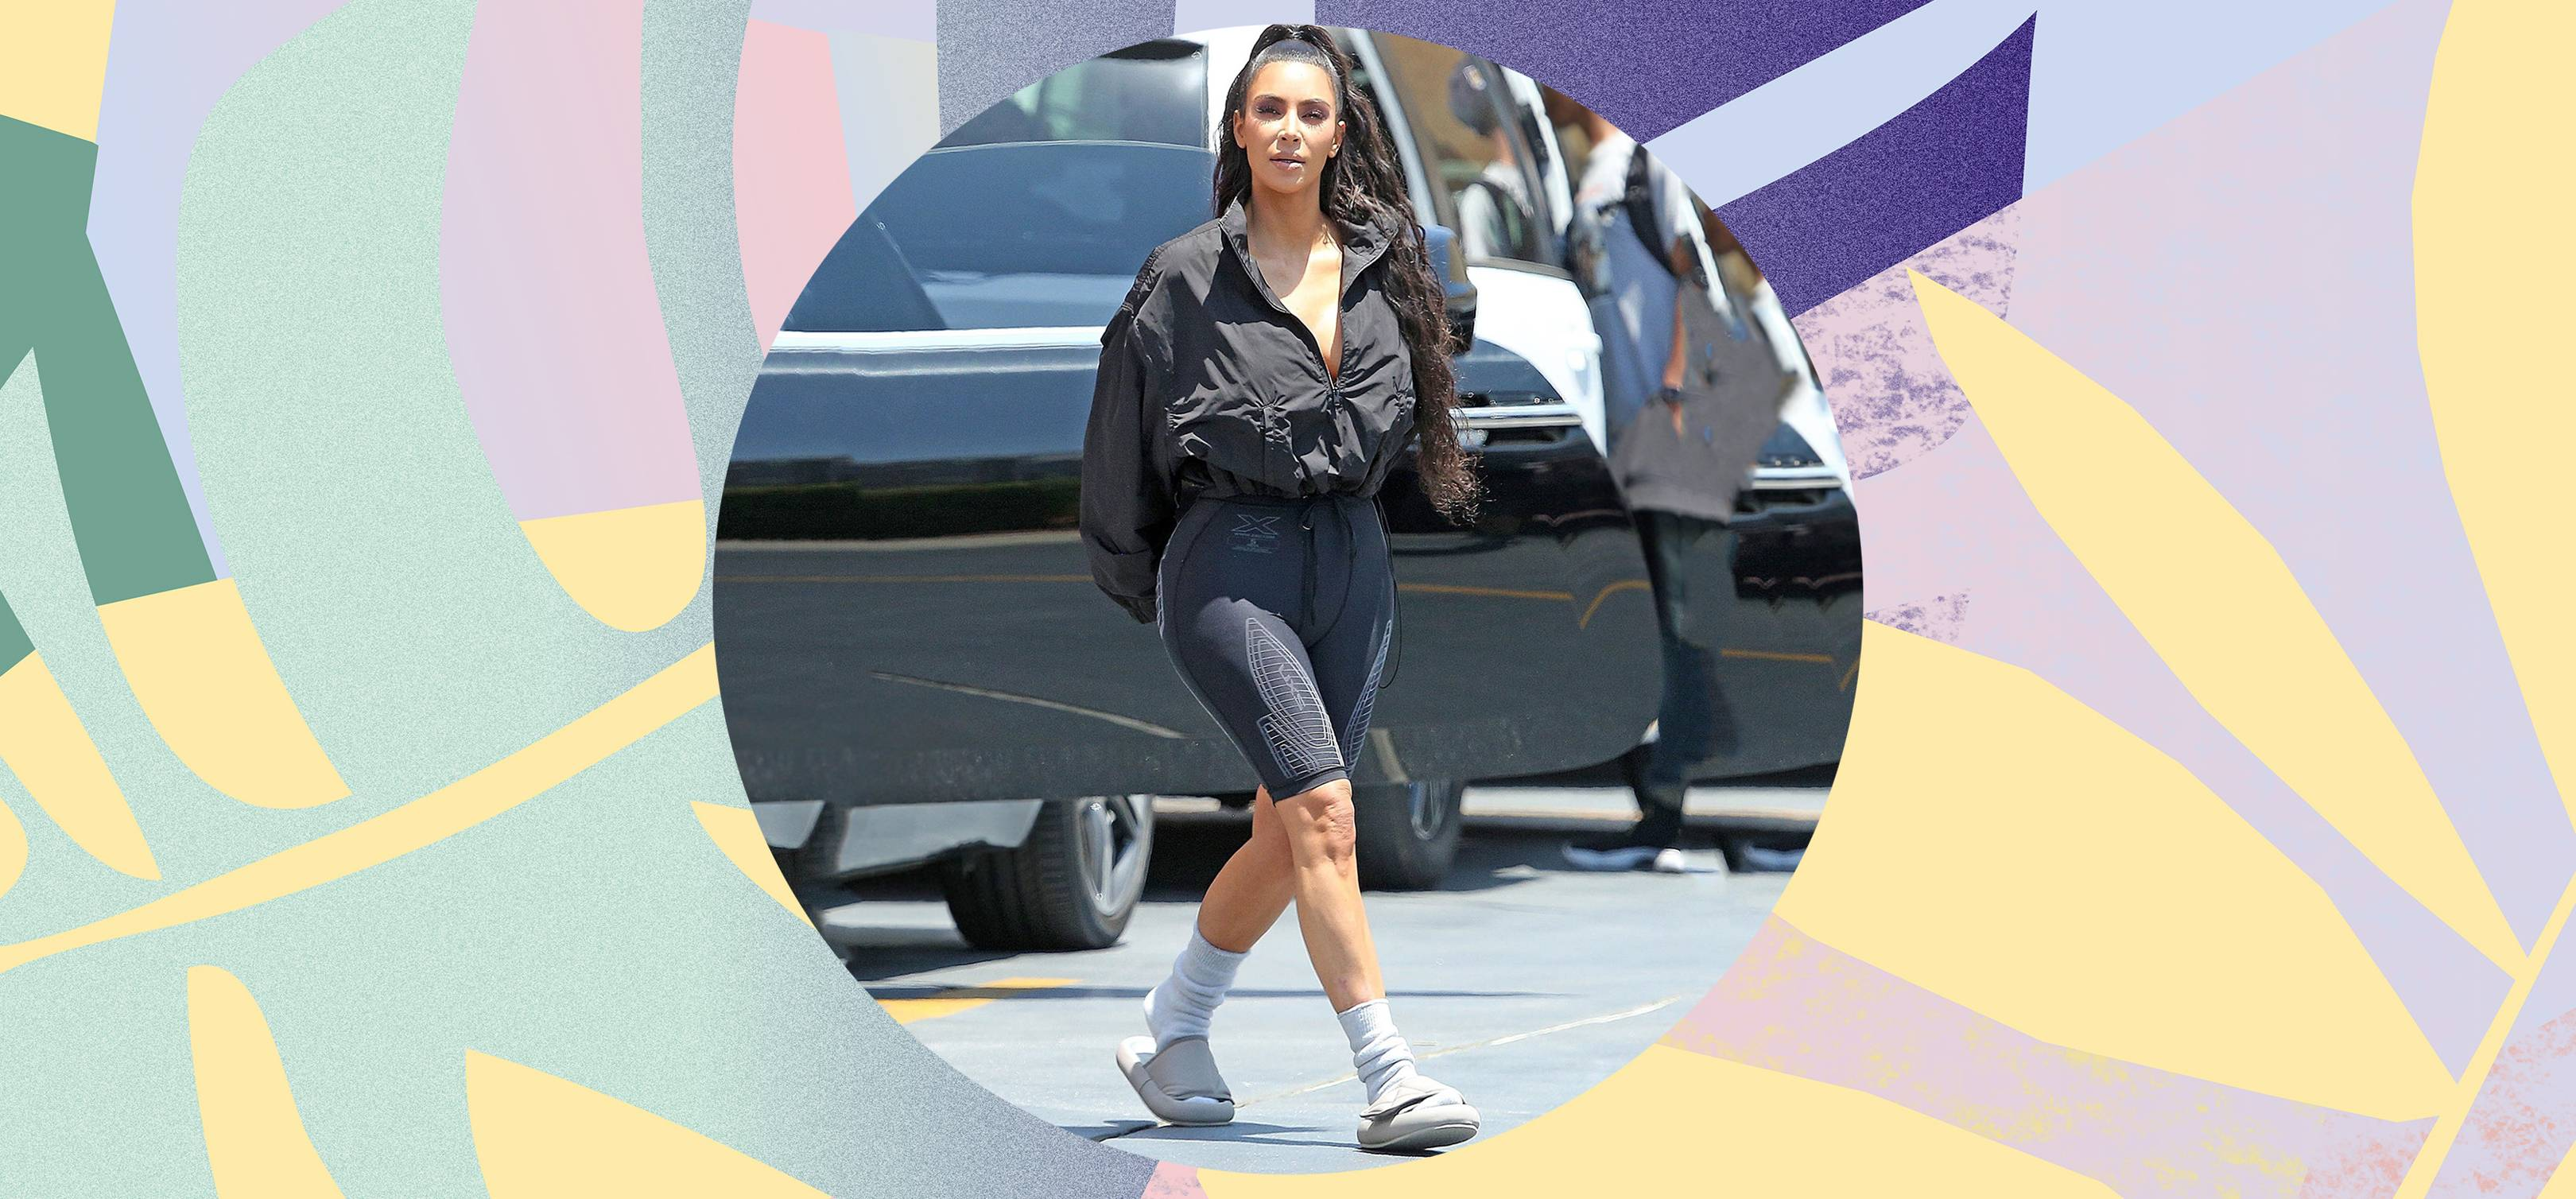 e343b465ec6e5 Socks And Sliders Fashion Trend | Glamour UK